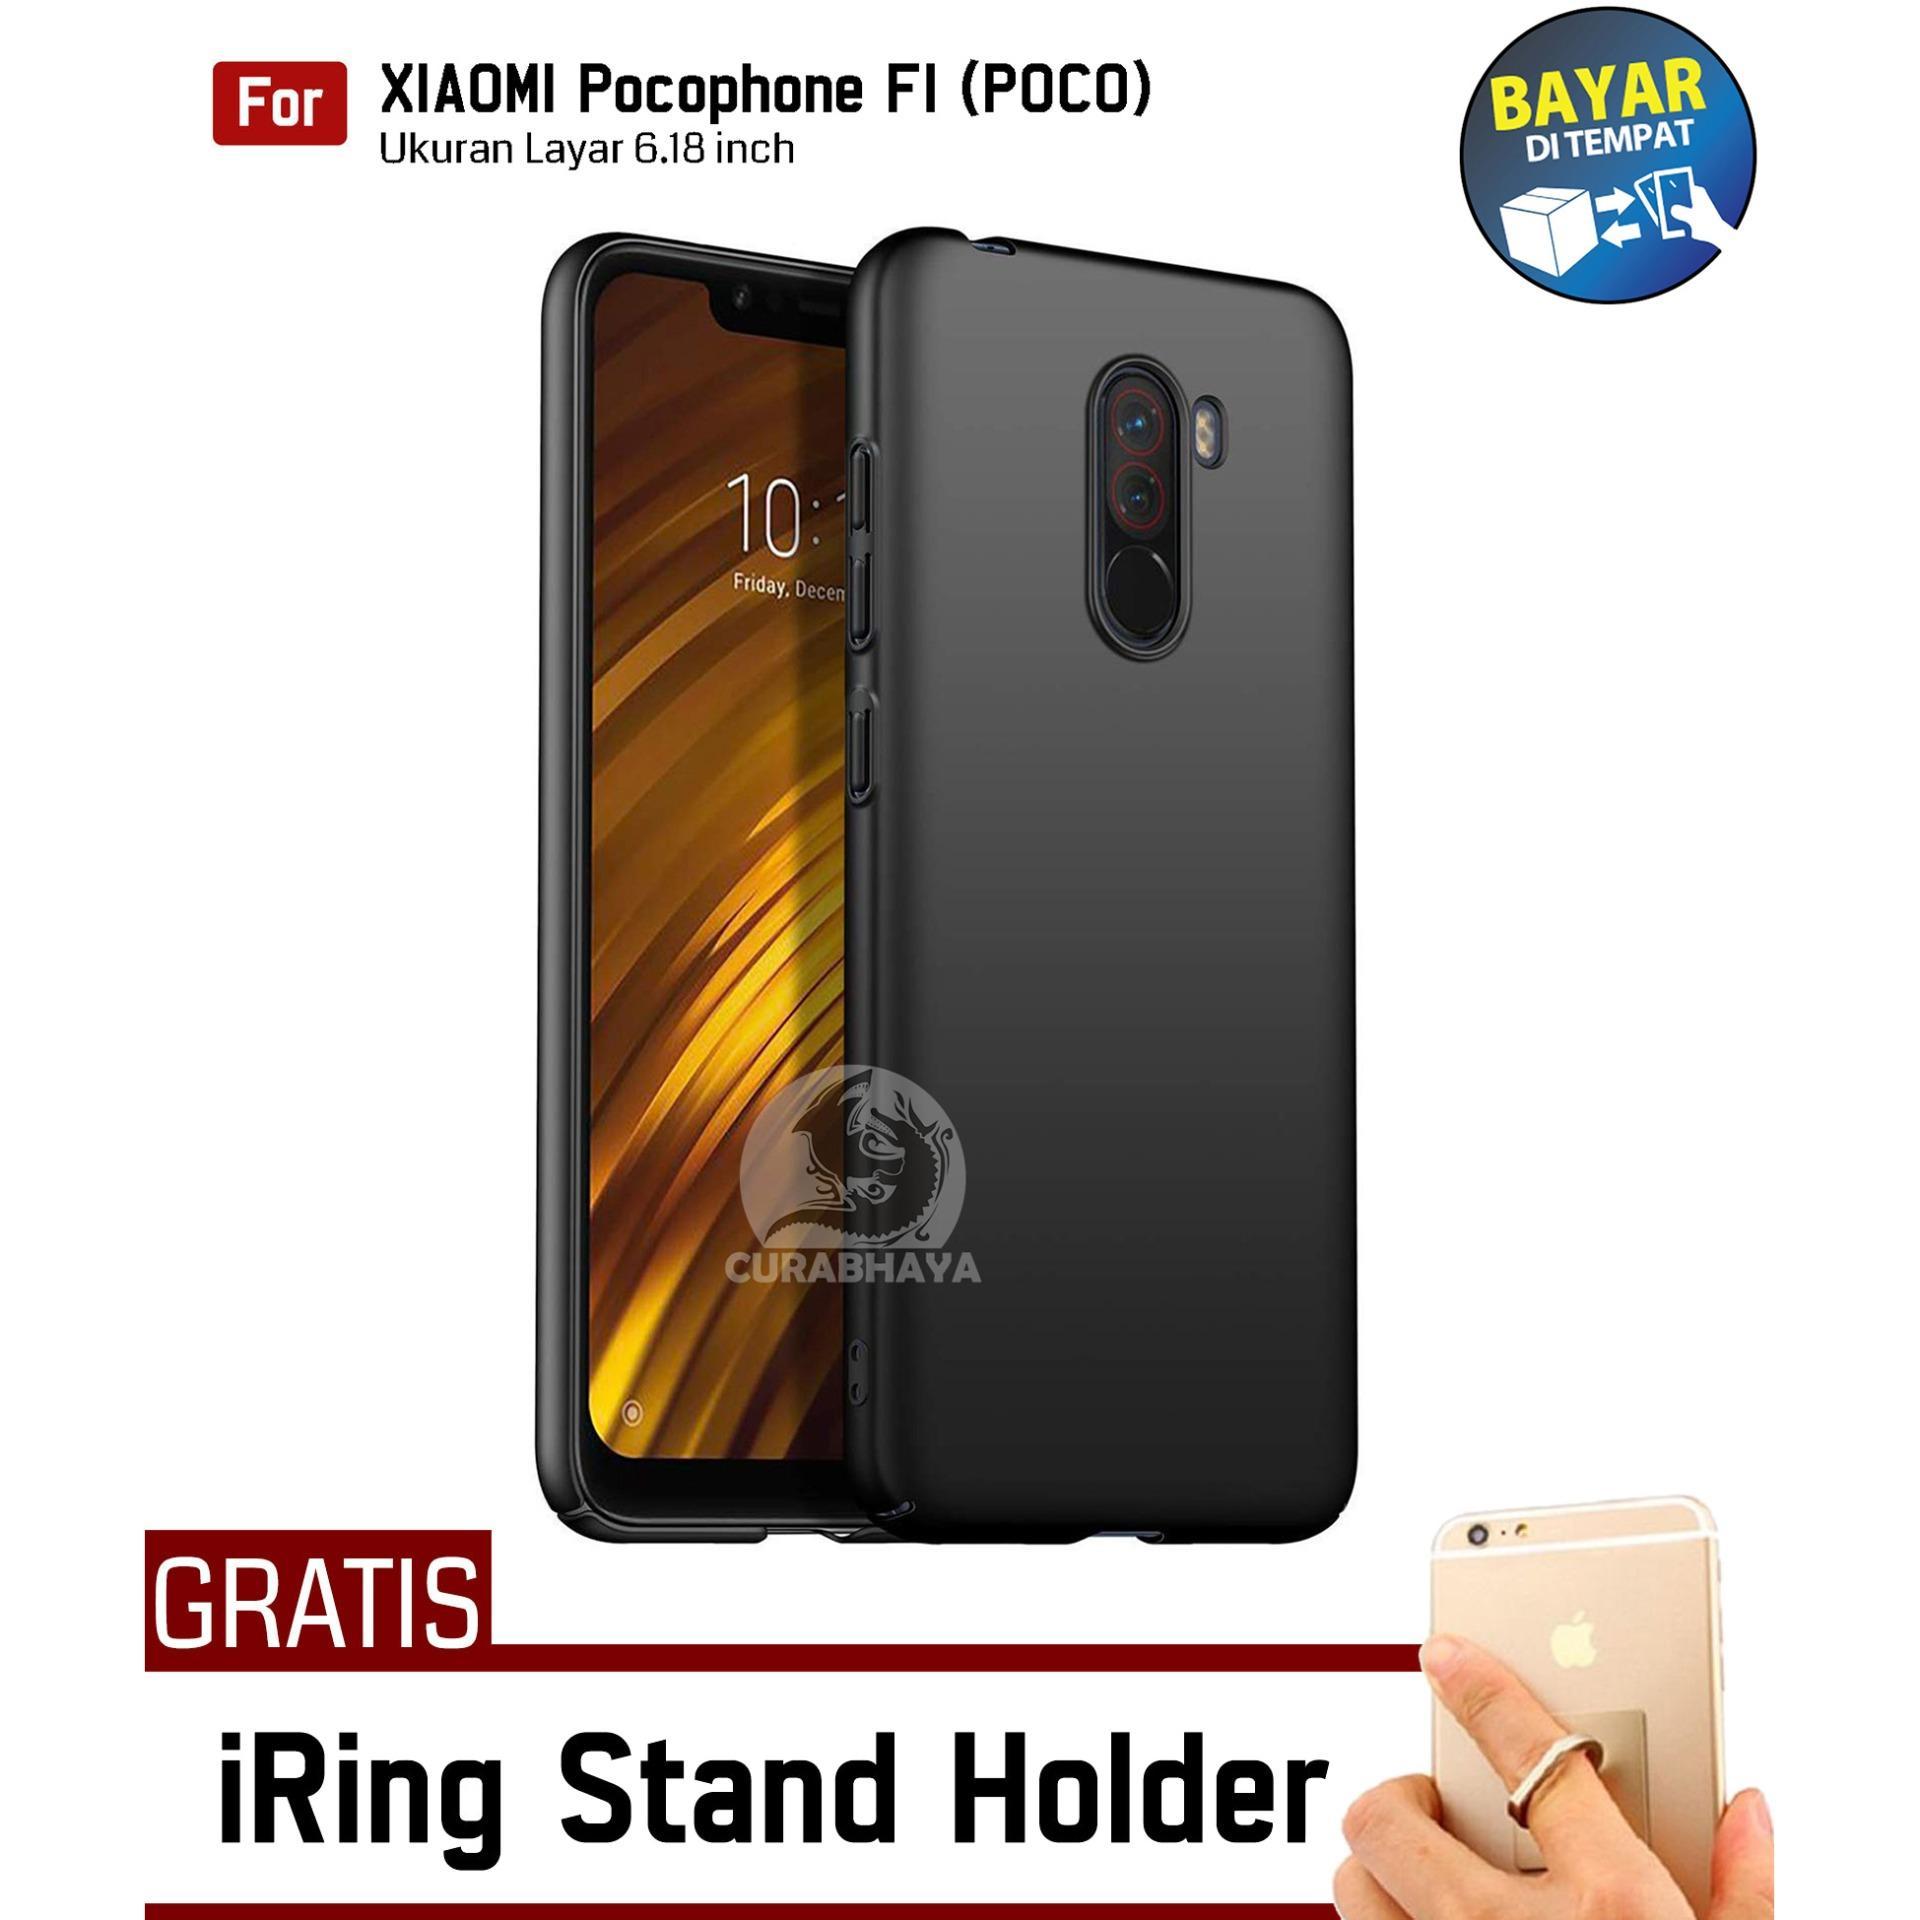 MidNight Xiaomi Pocophone F1 (POCO) | Slim Case Black Matte Softcase Premium Baby Skin